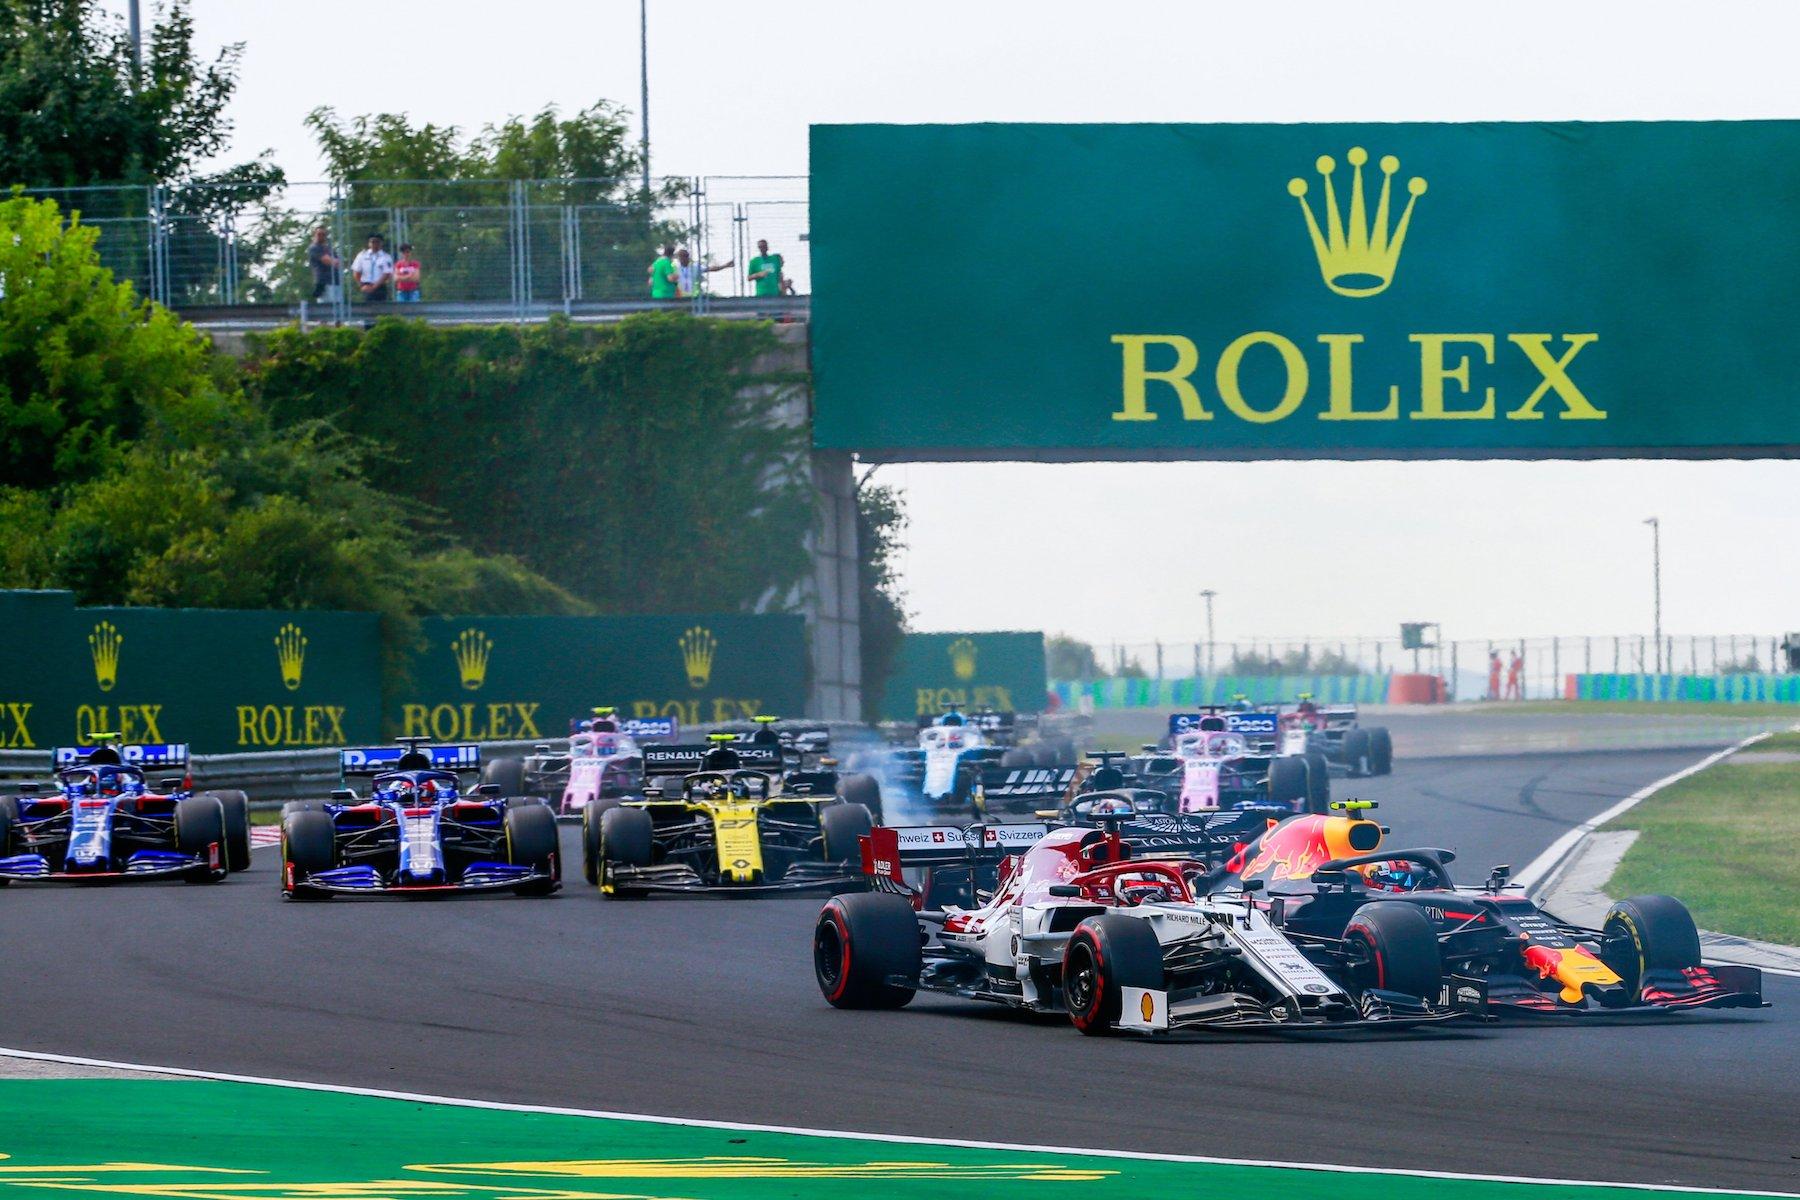 6 2019 Hungarian GP Sunday 57.jpg